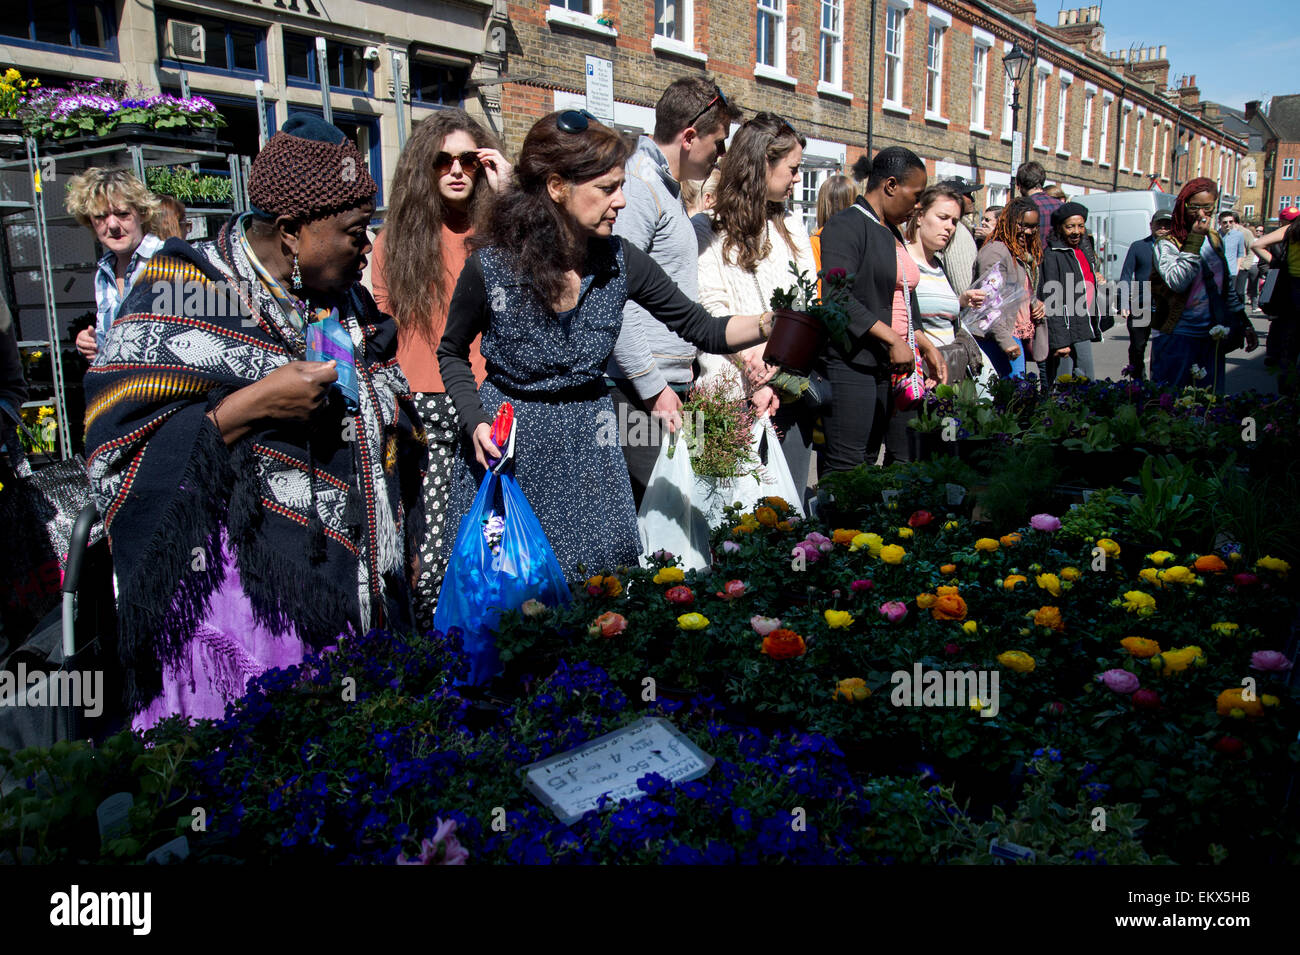 Columbia Road Sunday flower market, Spring 2015. Customers choose plants. - Stock Image